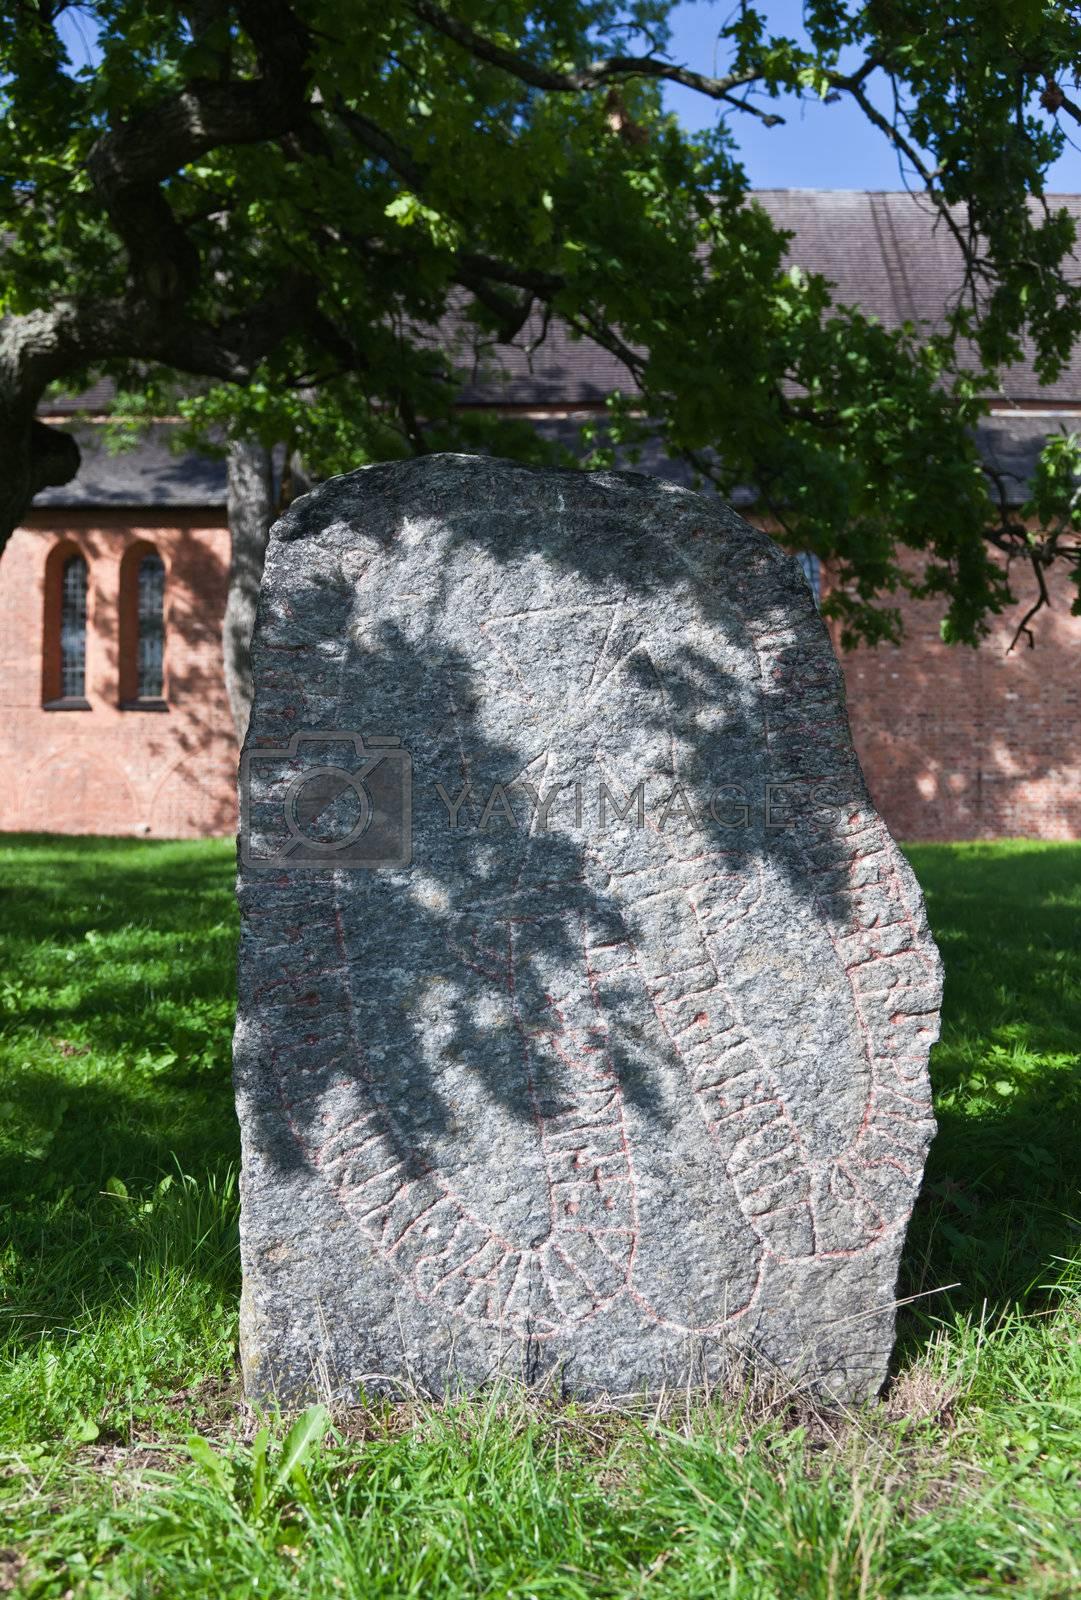 Ancient rune stone near uppsala in Sweden